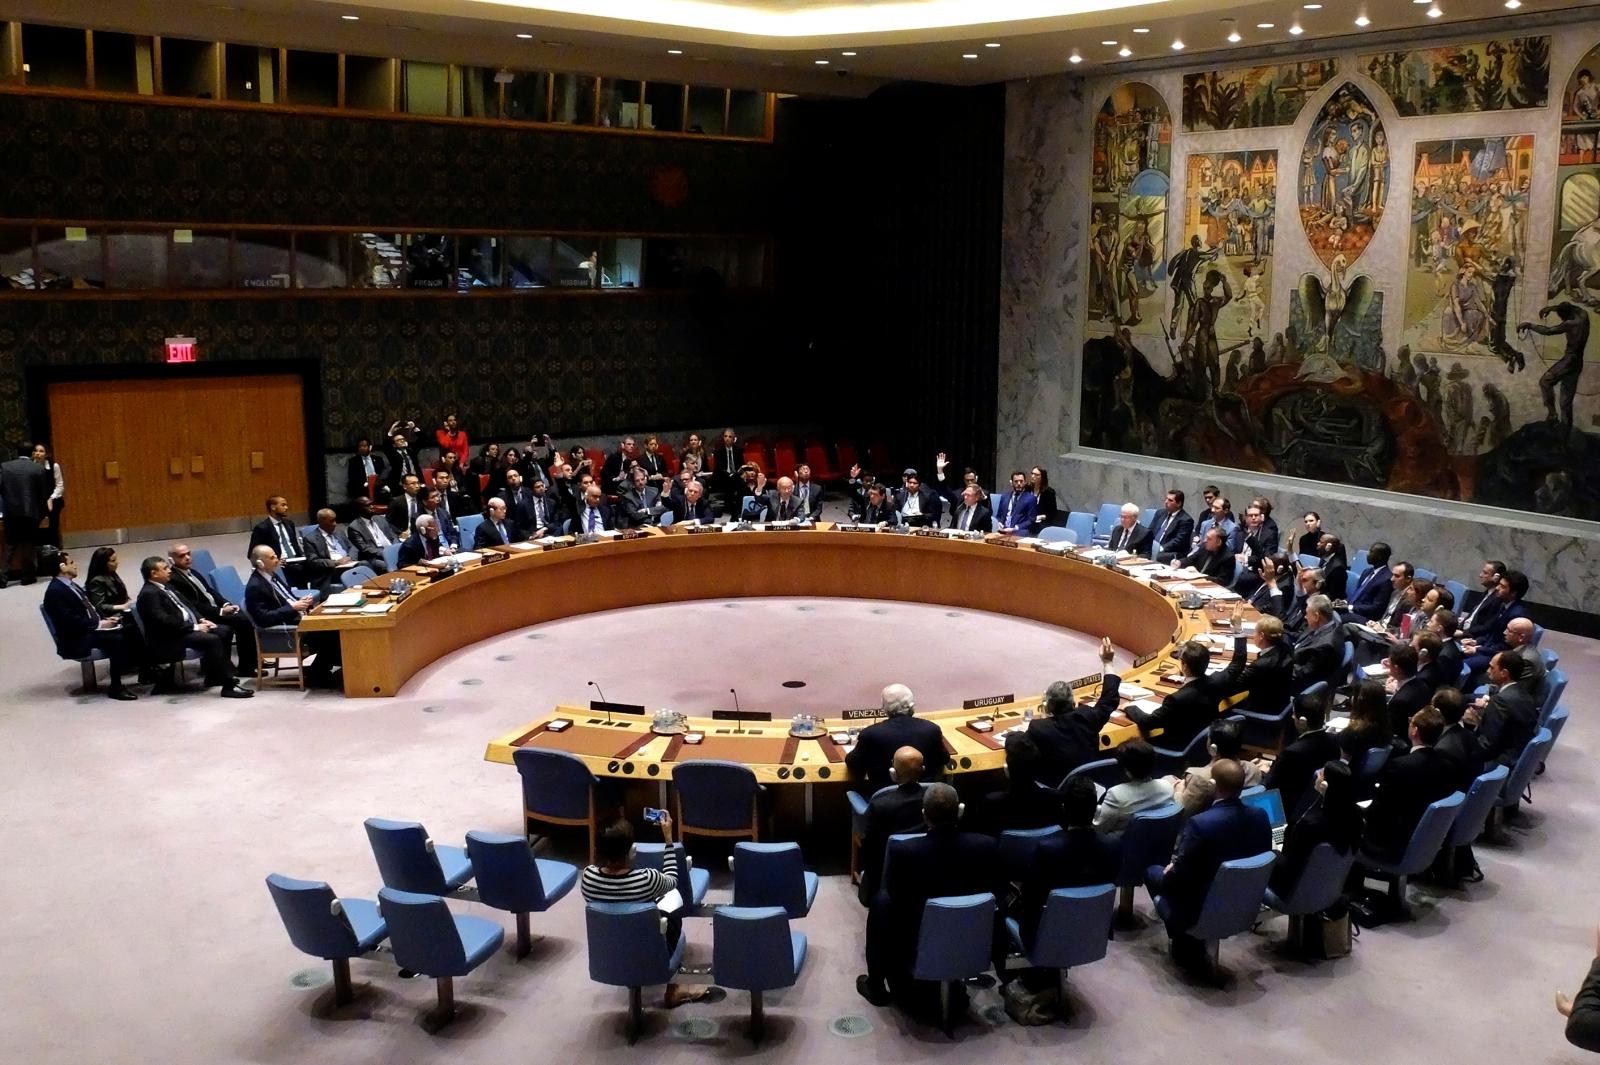 UNSC meeting